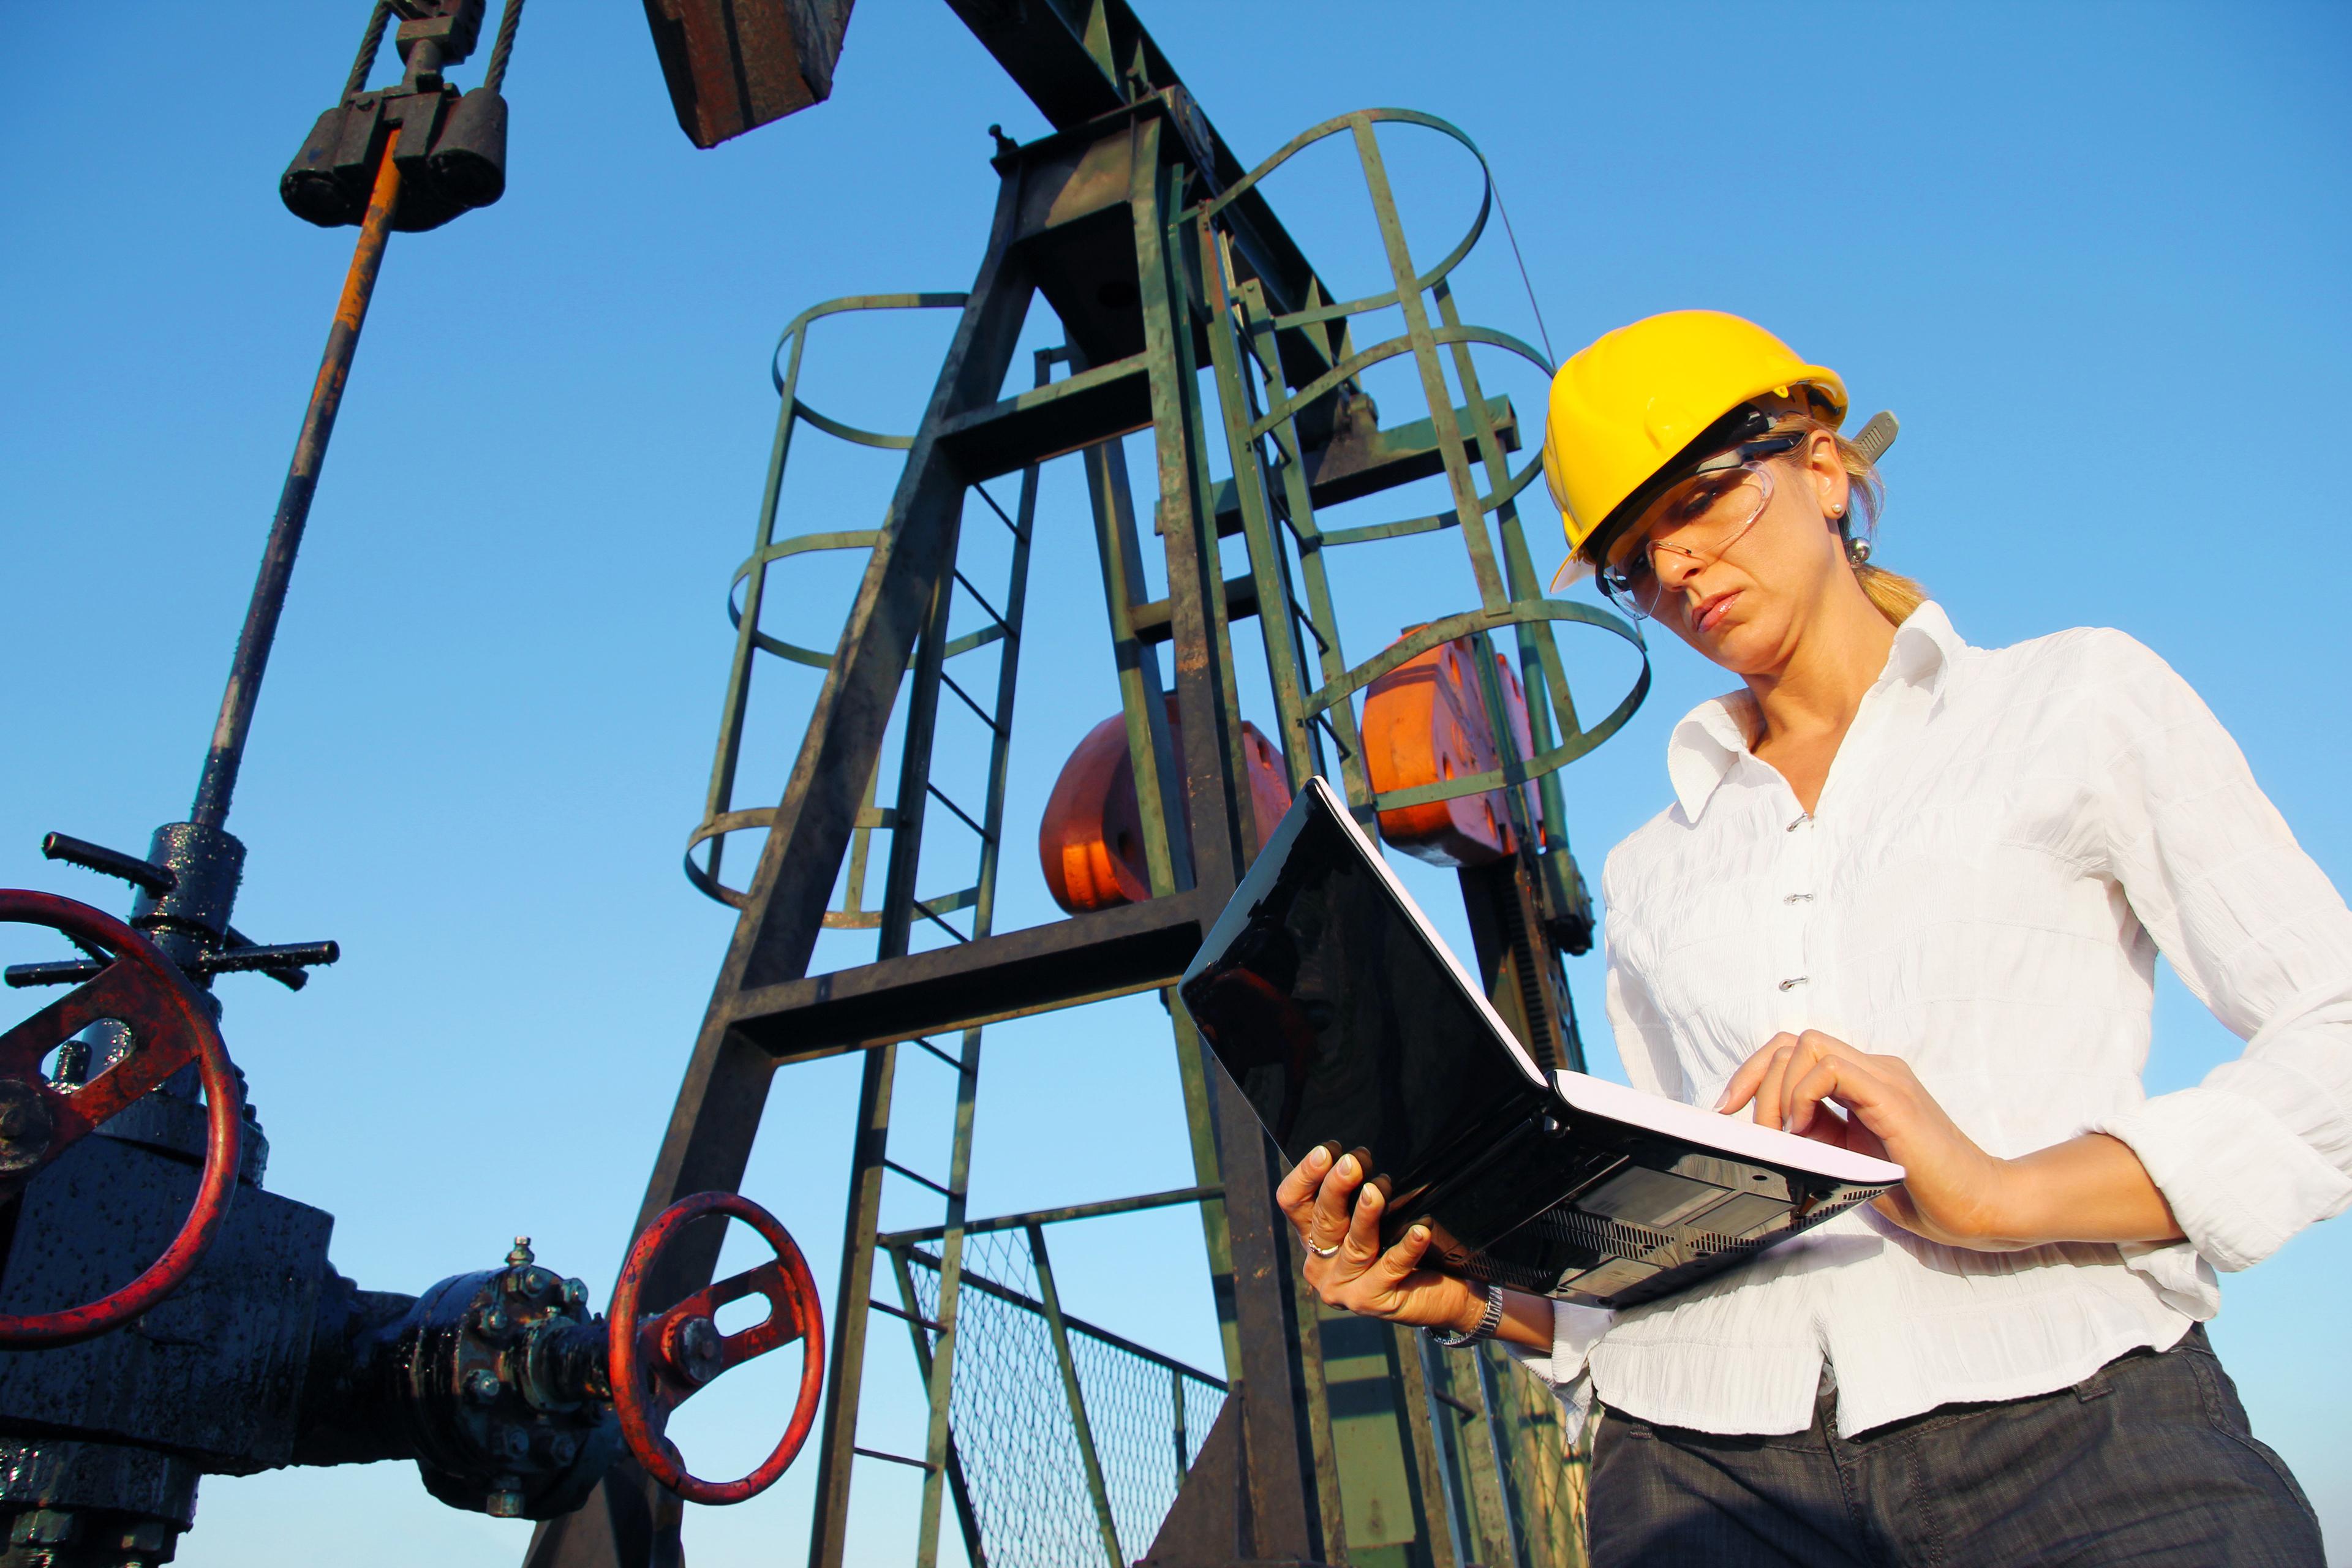 народ, фото рабочего дня на нефтяном предприятии один